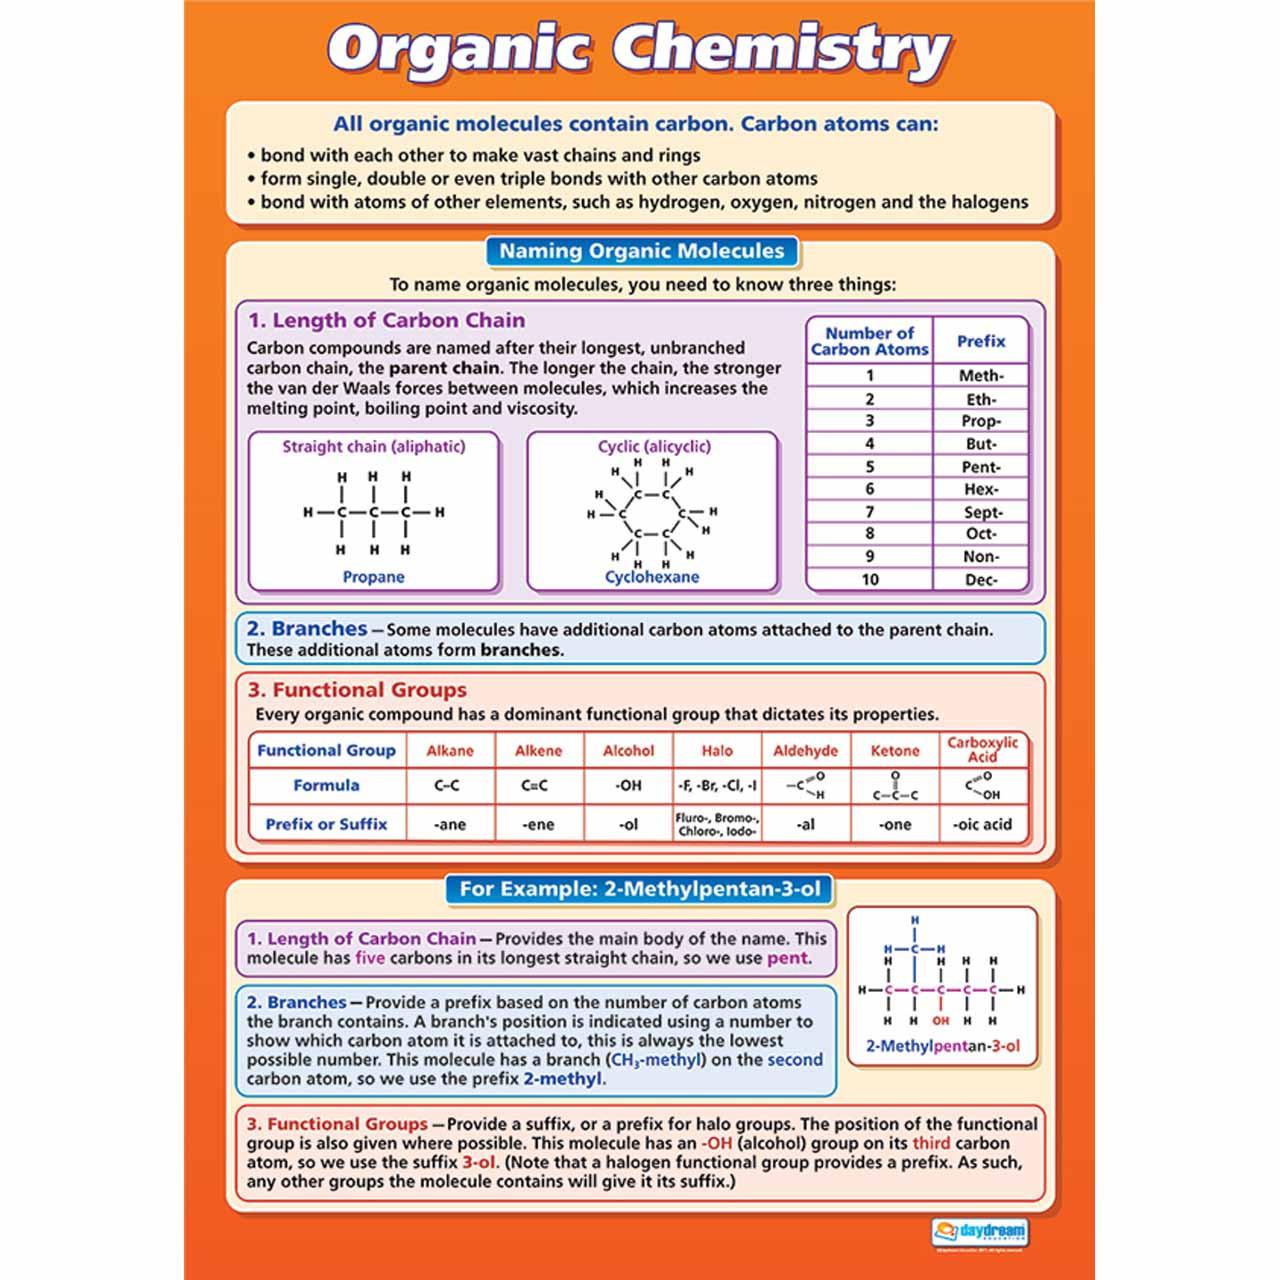 Organic Chemistry Laminated